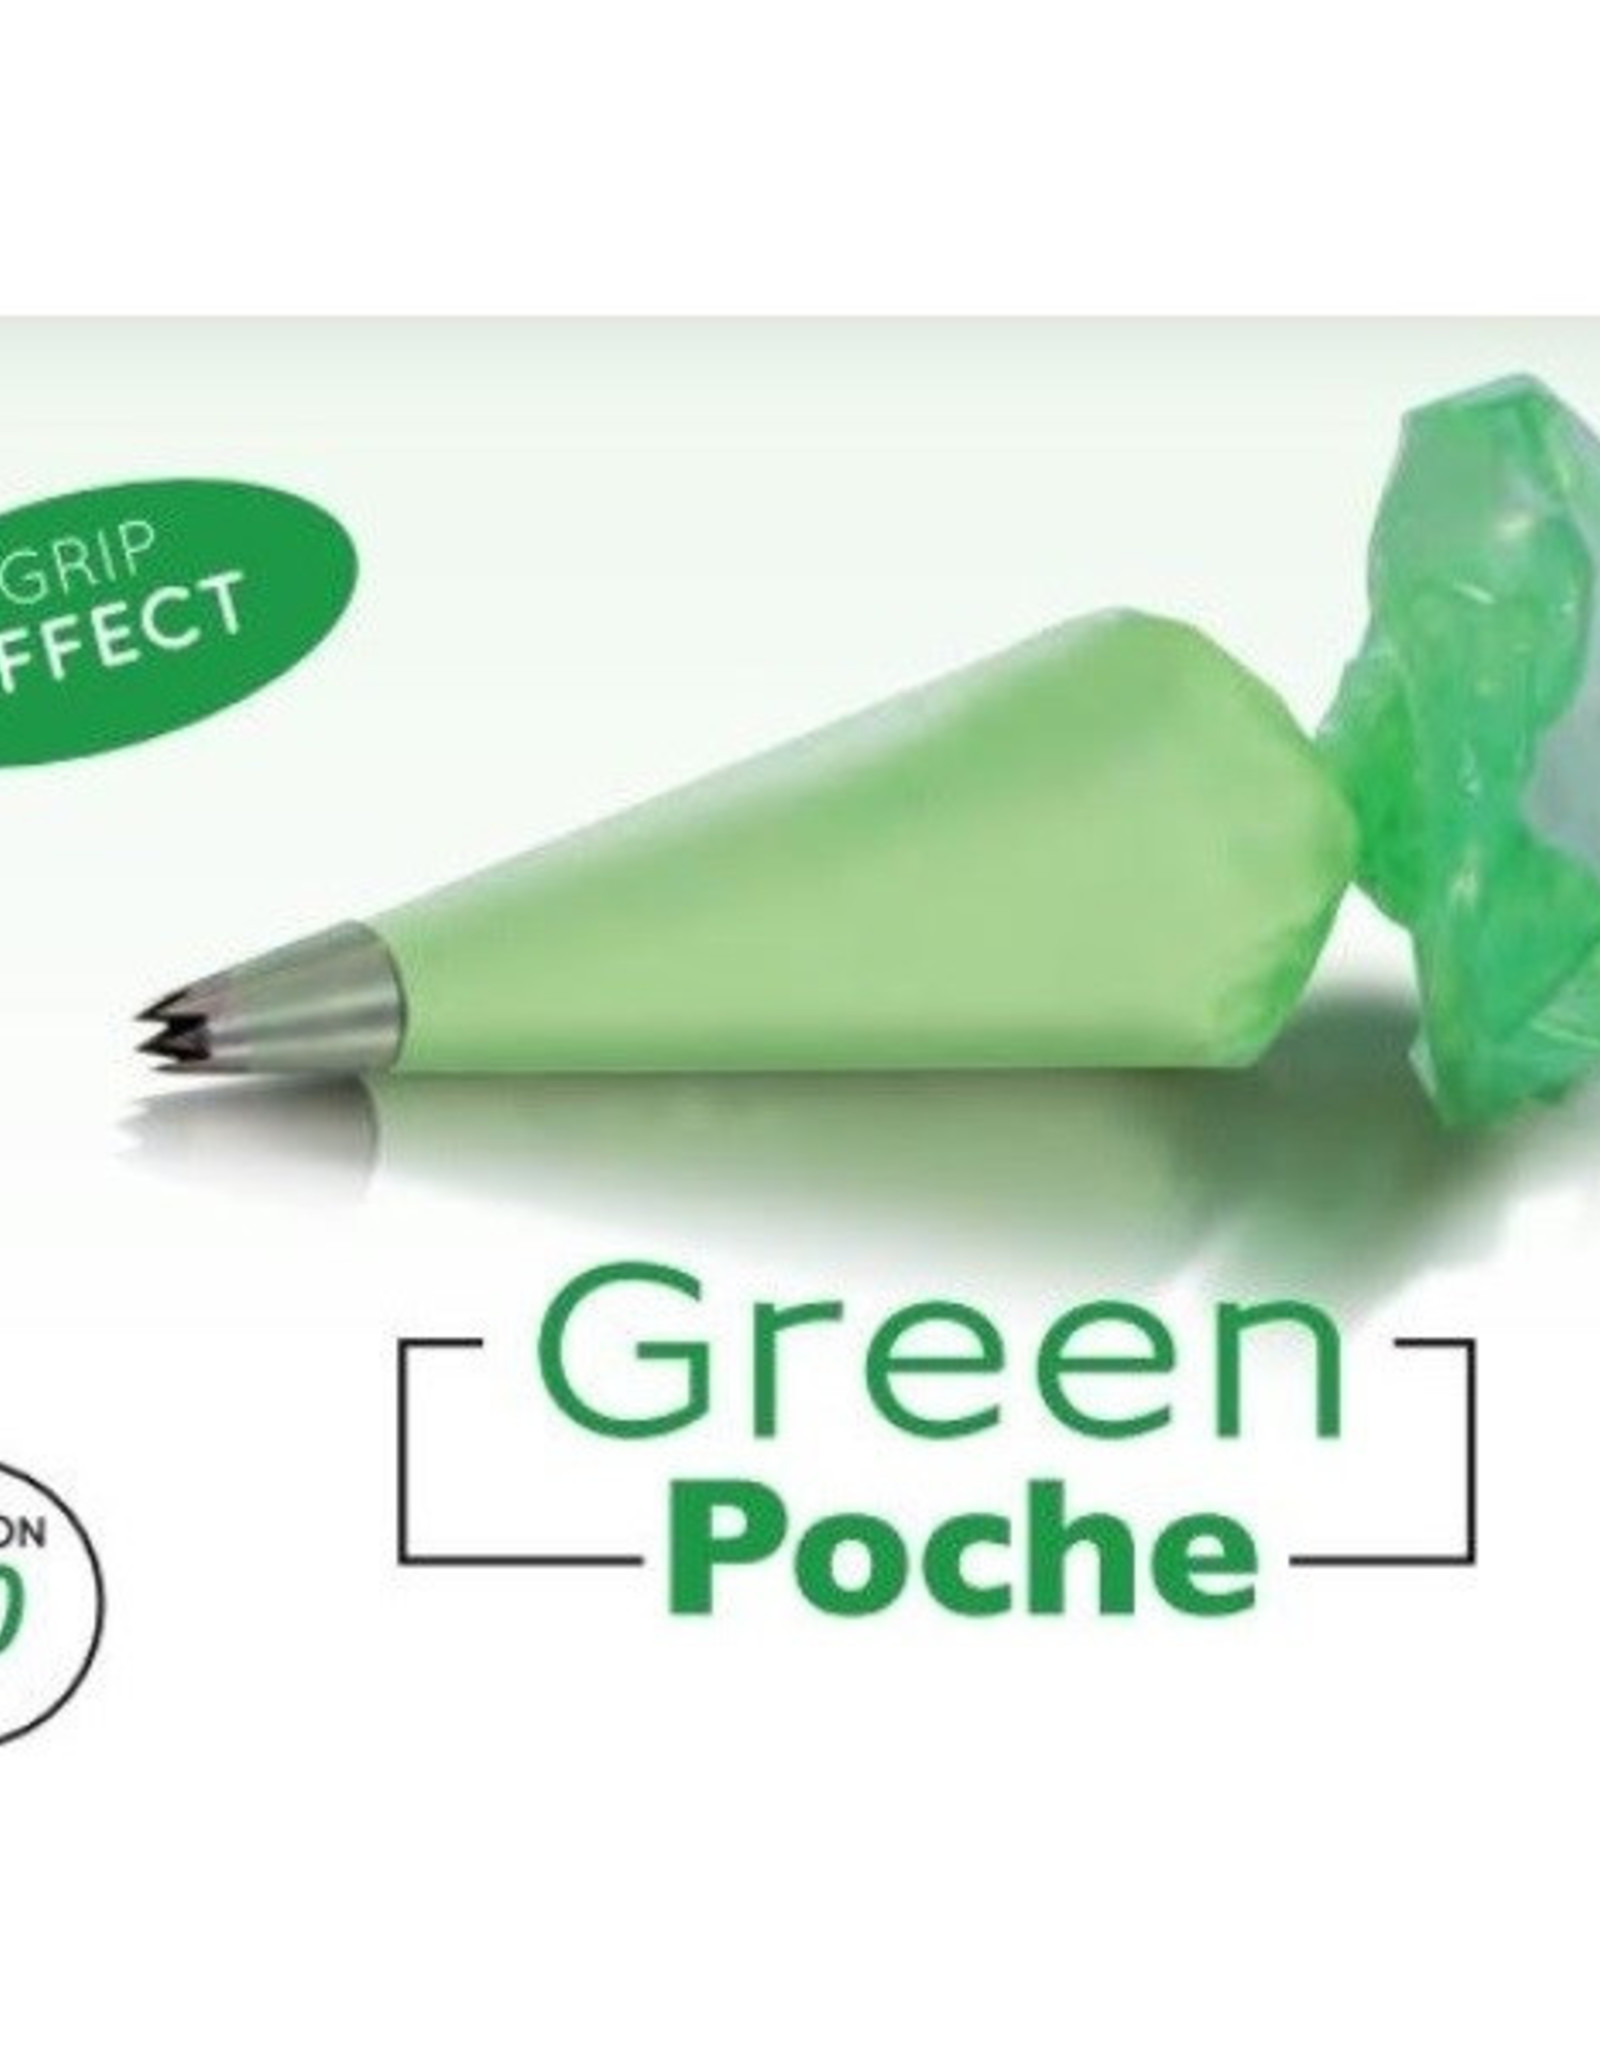 Martellato Martellato Wegwerp Spuitzak 30 cm Groen 100 stuks